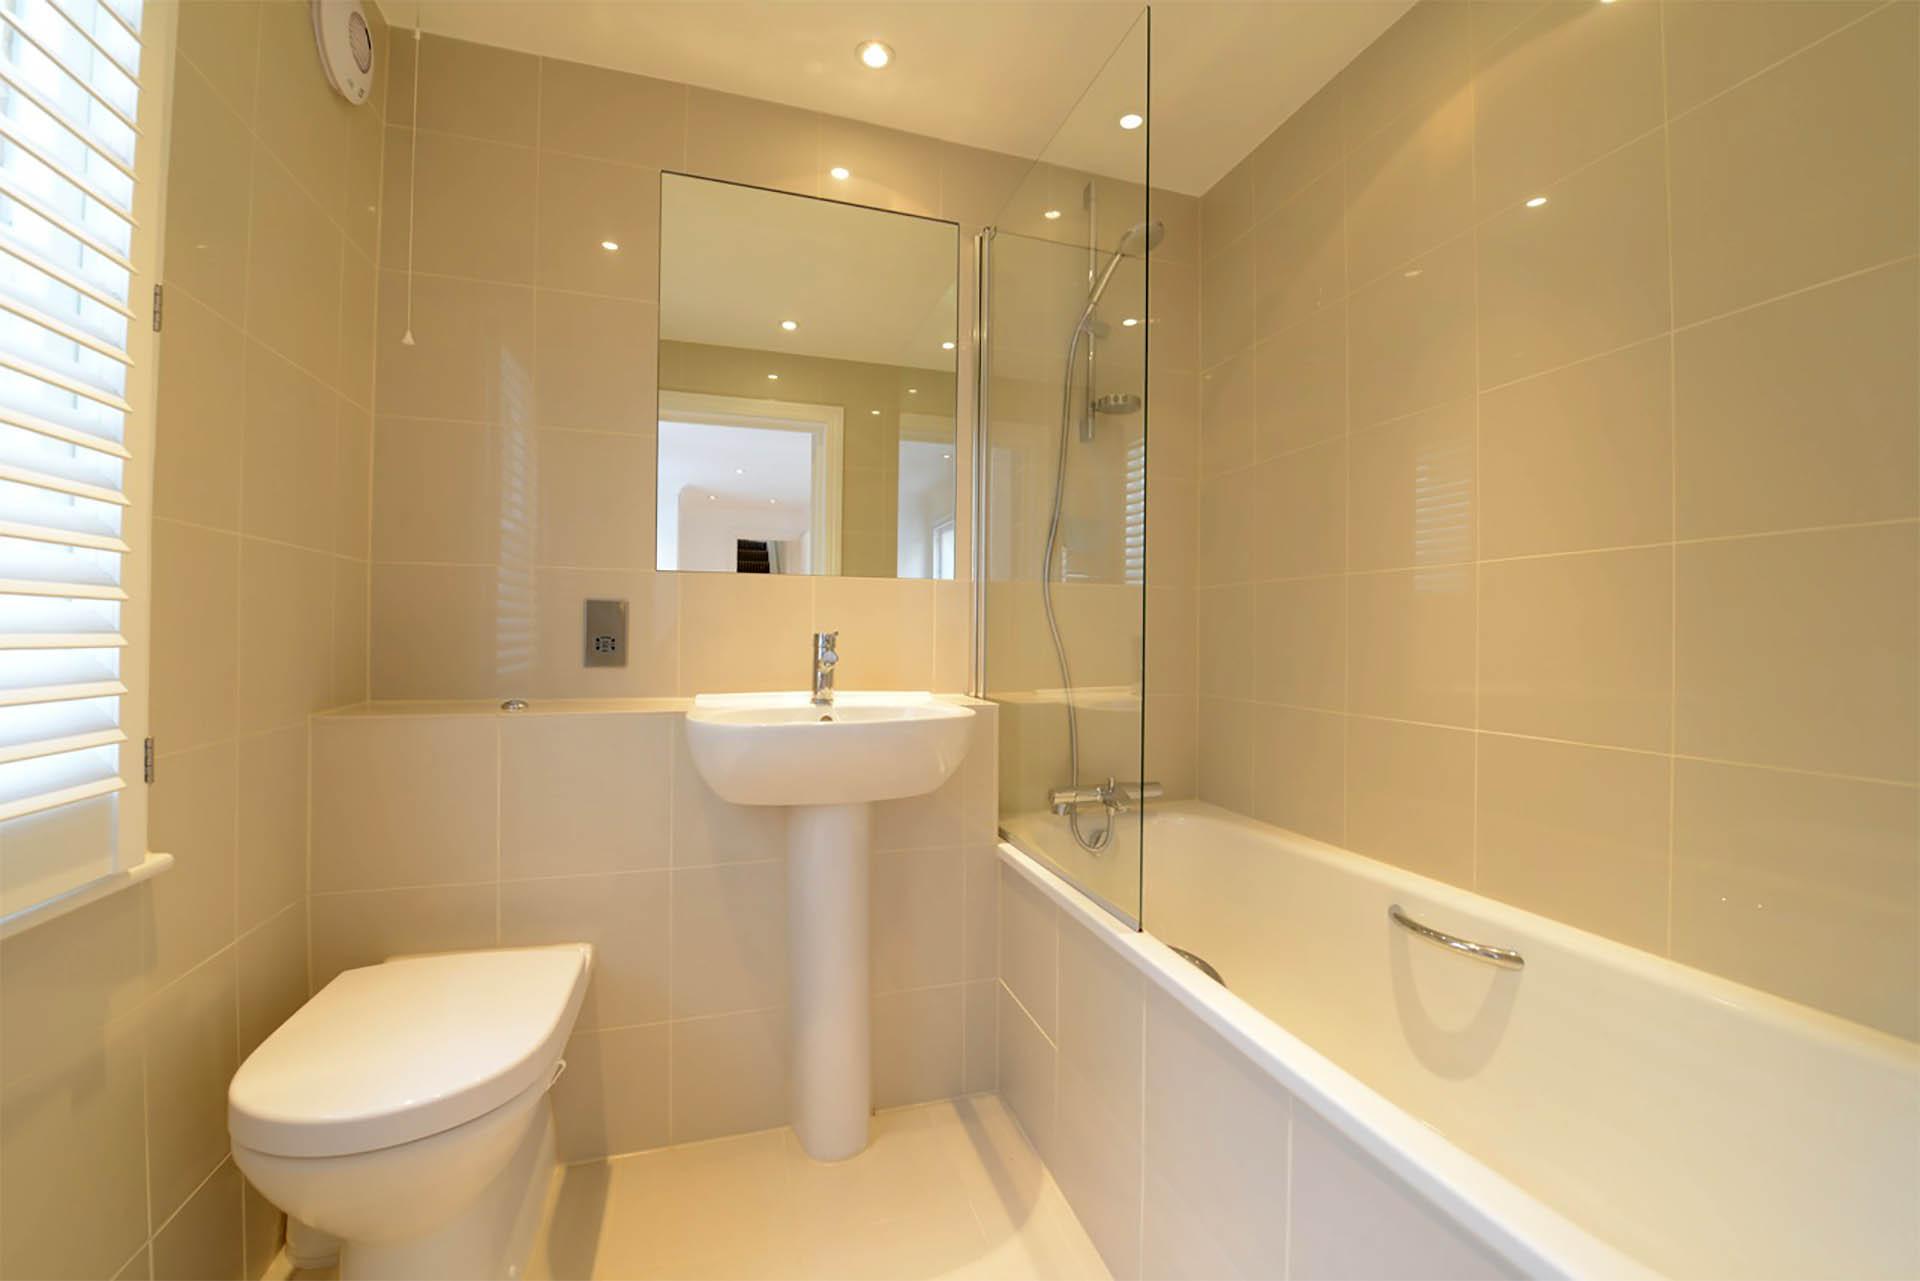 Chepstow Crescent bathroom